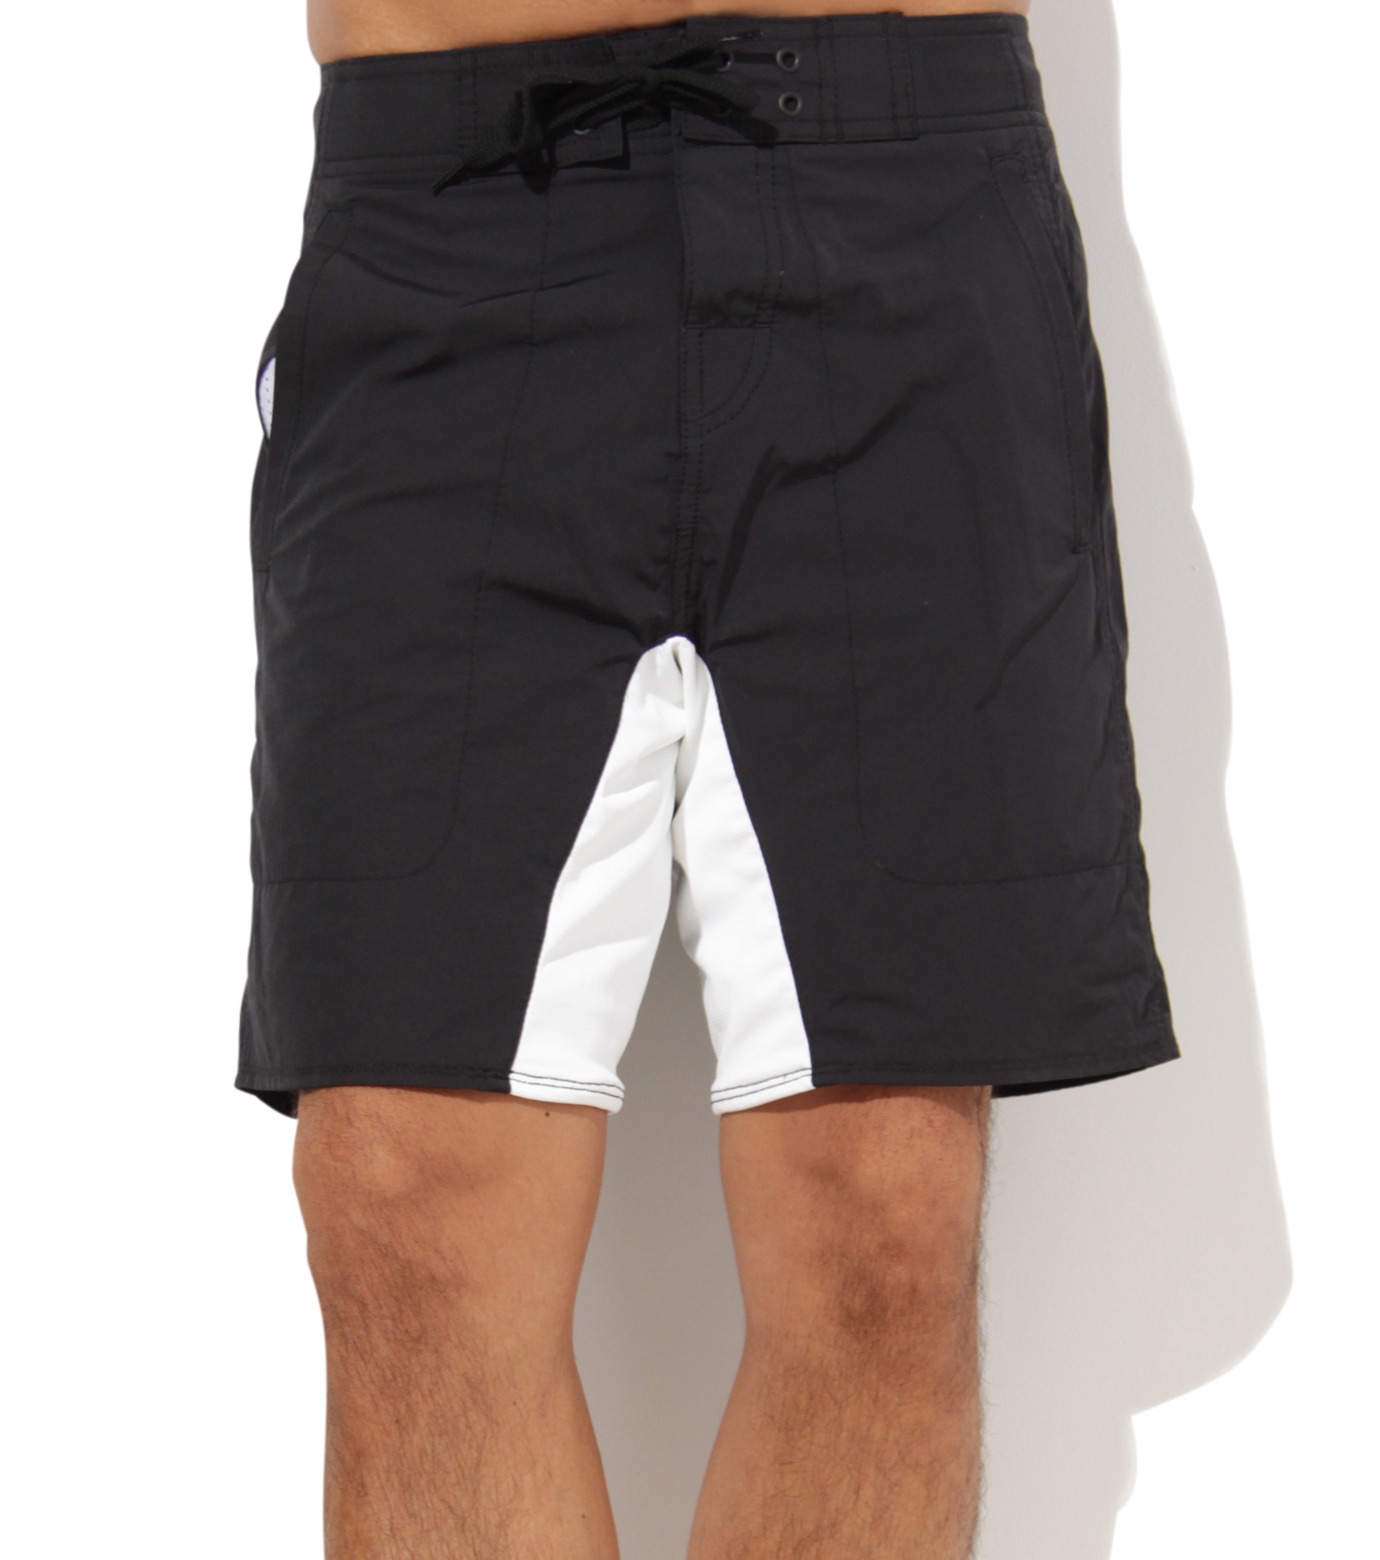 TWO TWO ONE(トゥートゥーワン)のSurf shorts short-WHITE(SWIMWEAR/SWIMWEAR)-15N948001-4 拡大詳細画像3